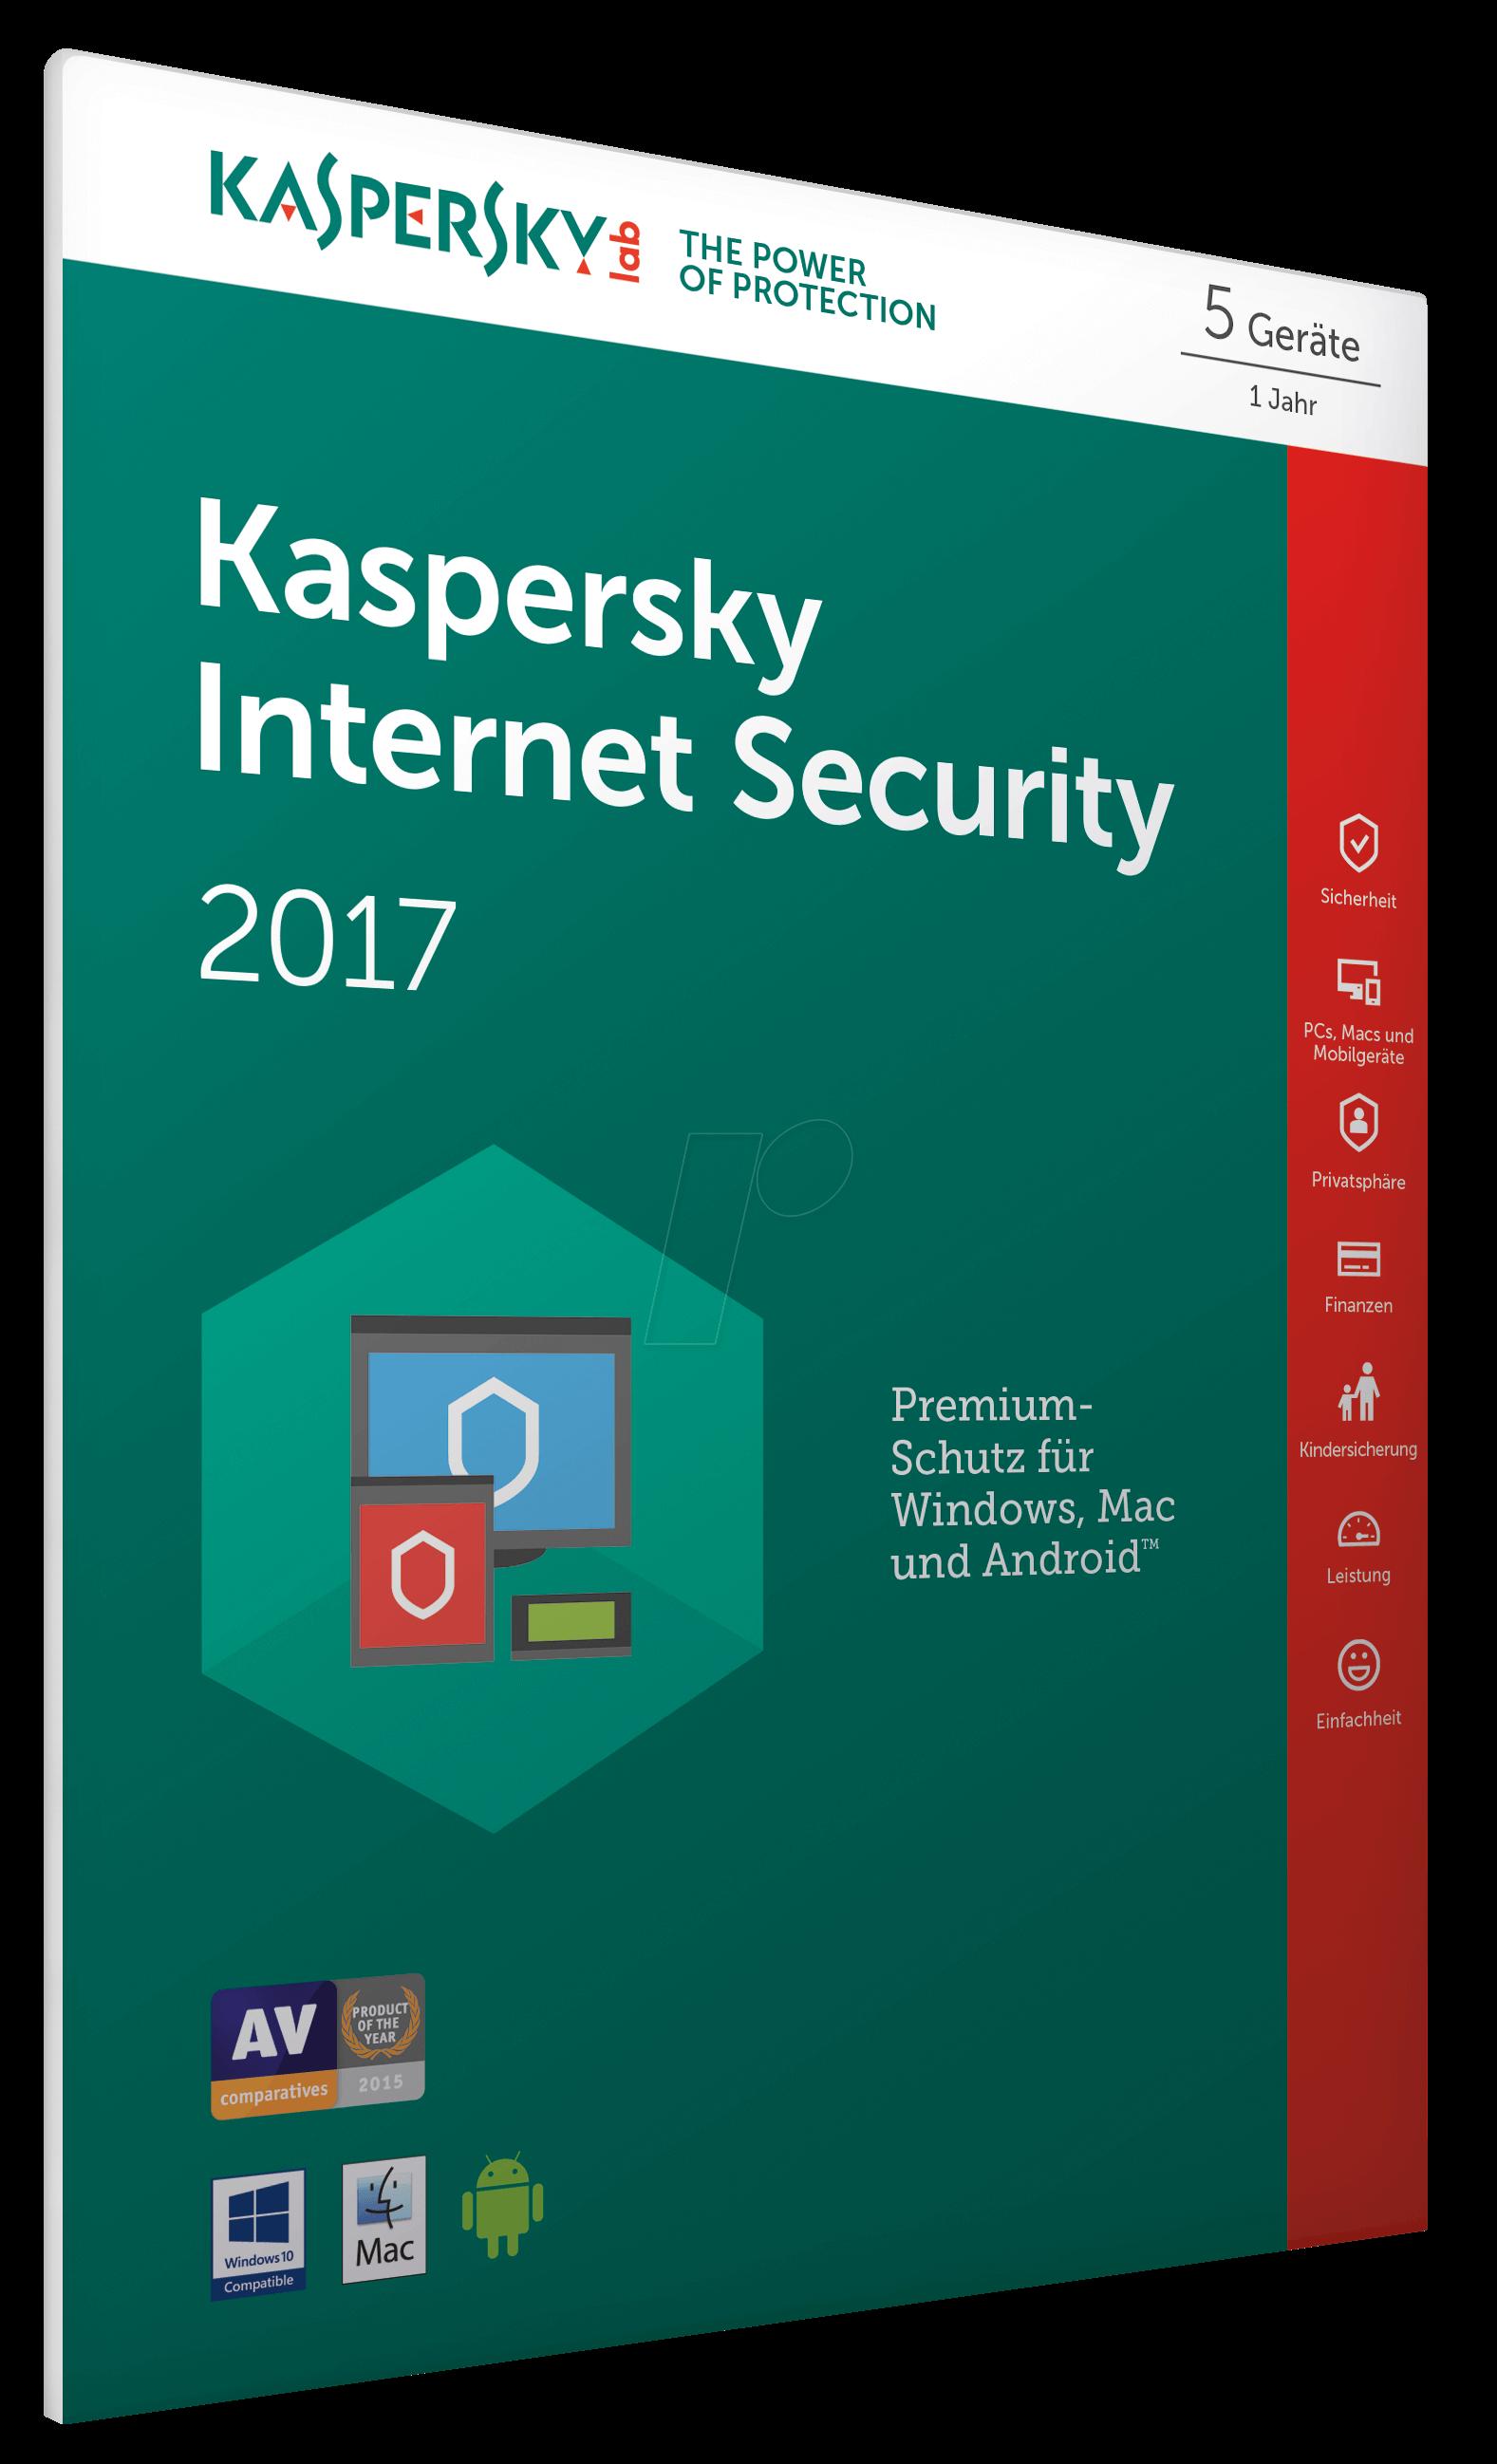 https://cdn-reichelt.de/bilder/web/xxl_ws/G500/KASPERSKY_IS2017_5U_01.png